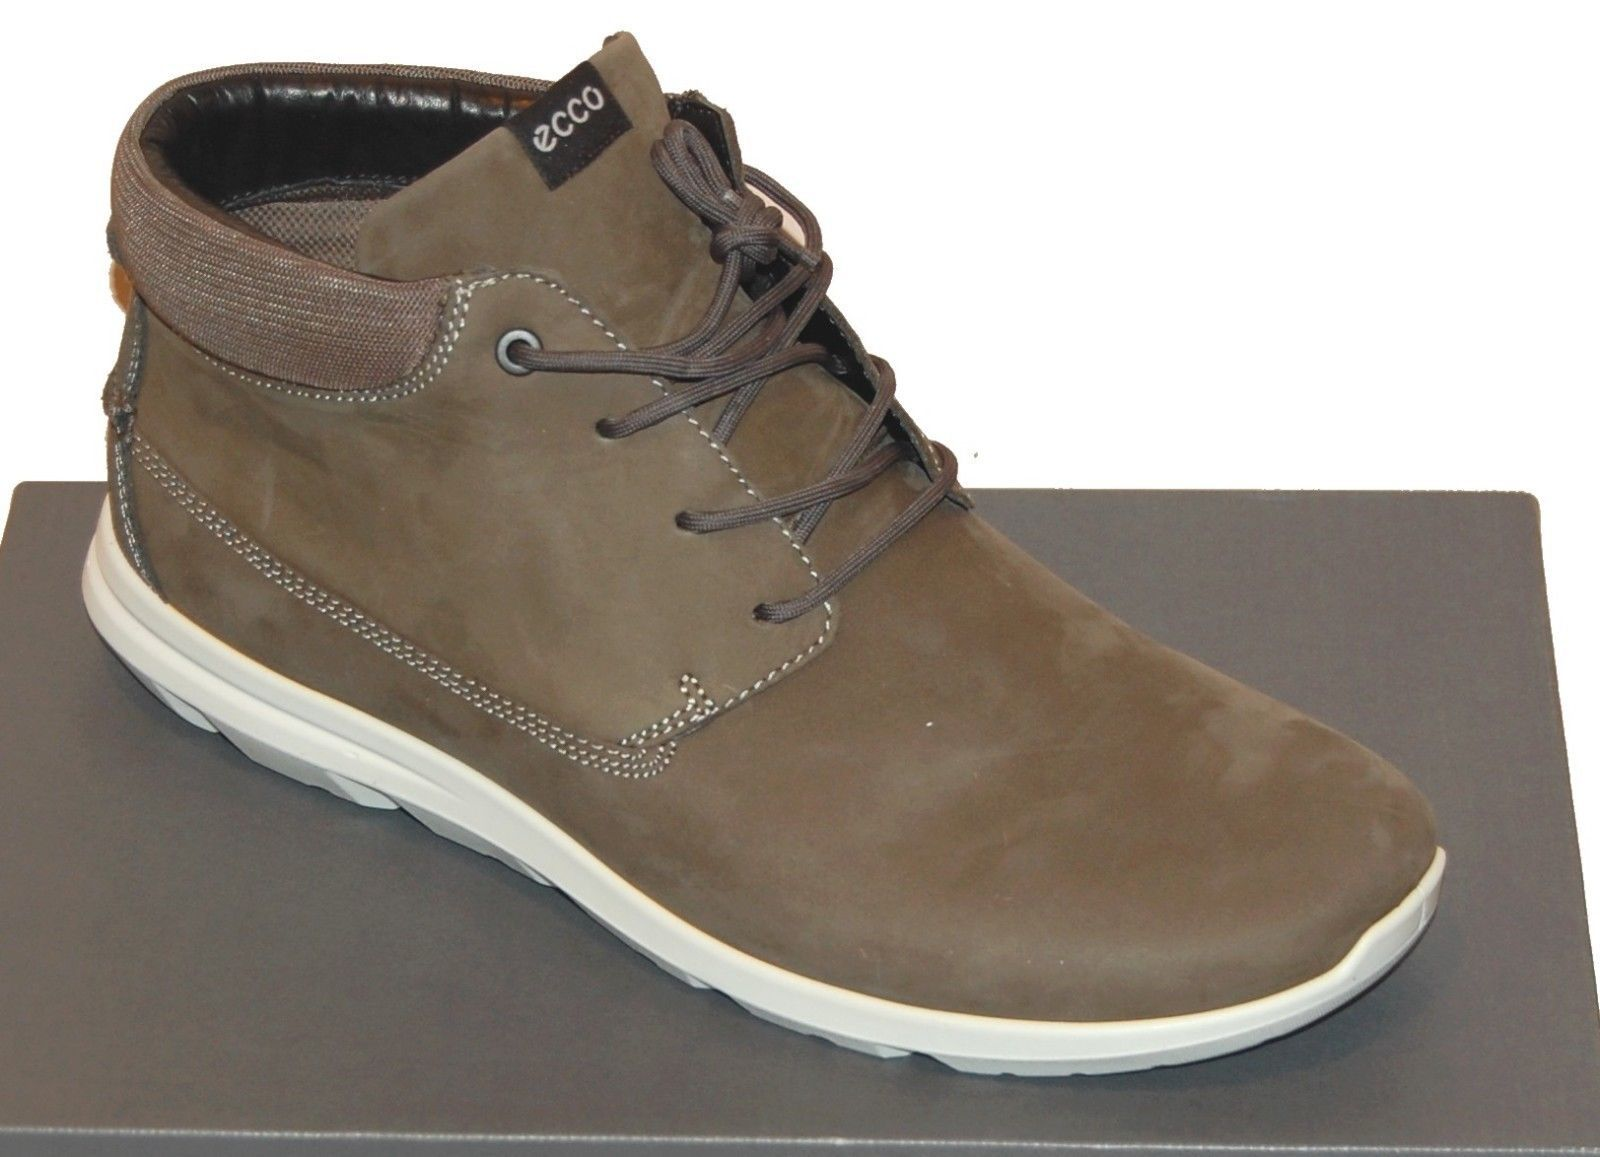 fe0525b5a86 Ecco Men Dark Shadow Casual High Top Fashion and 50 similar items. S l1600